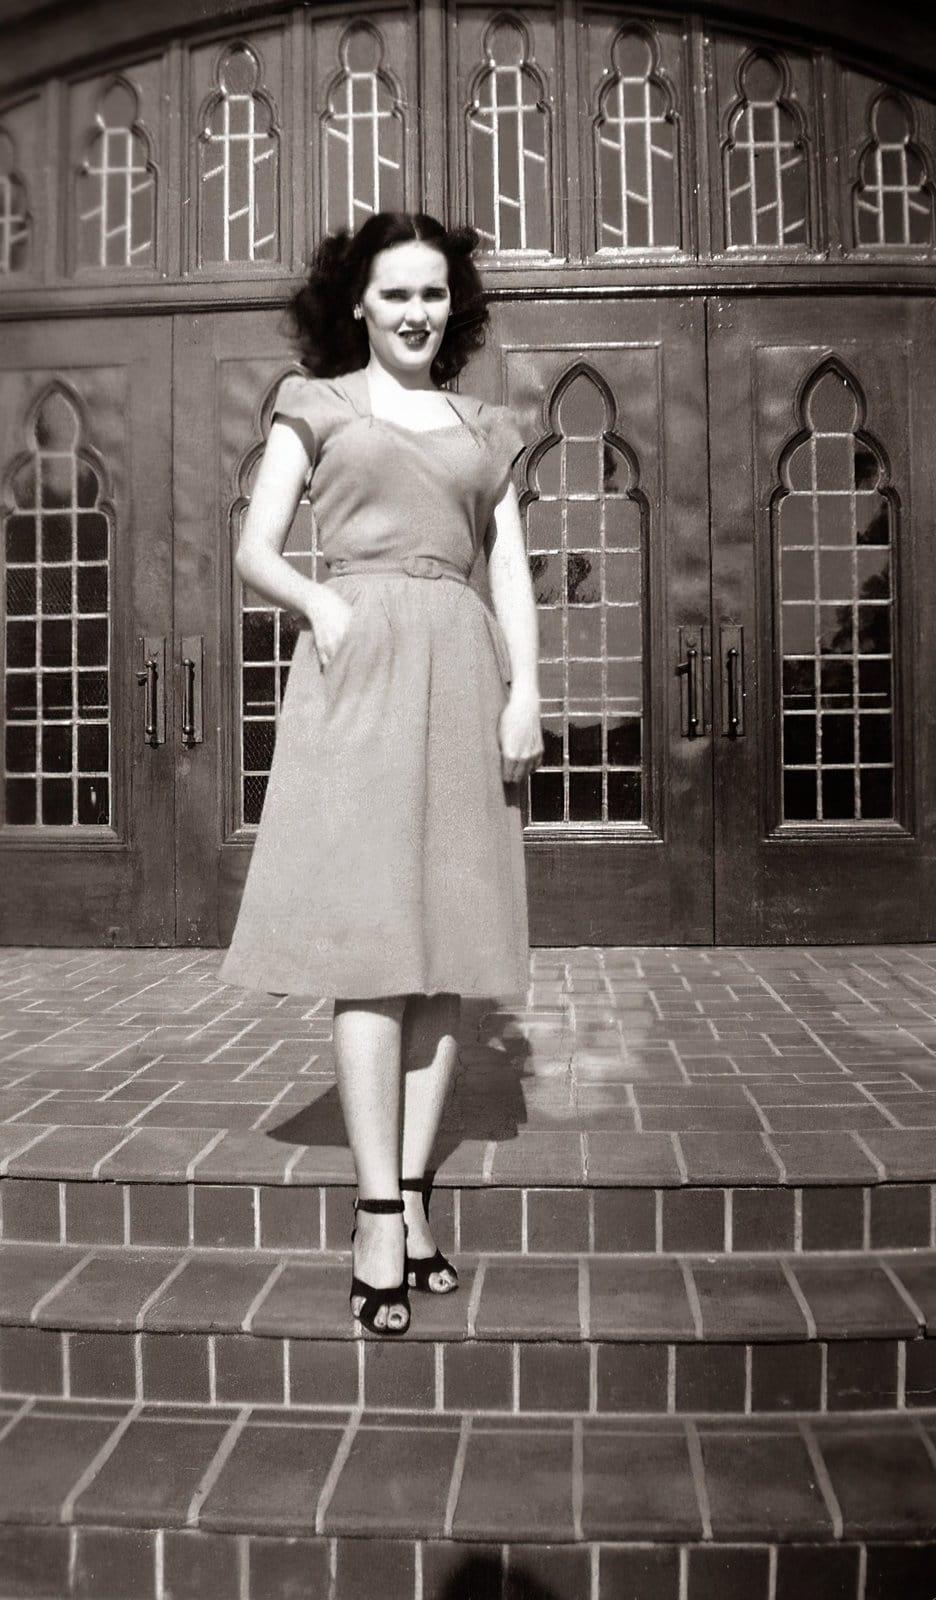 Black Dahlia - Elizabeth Short snapshots